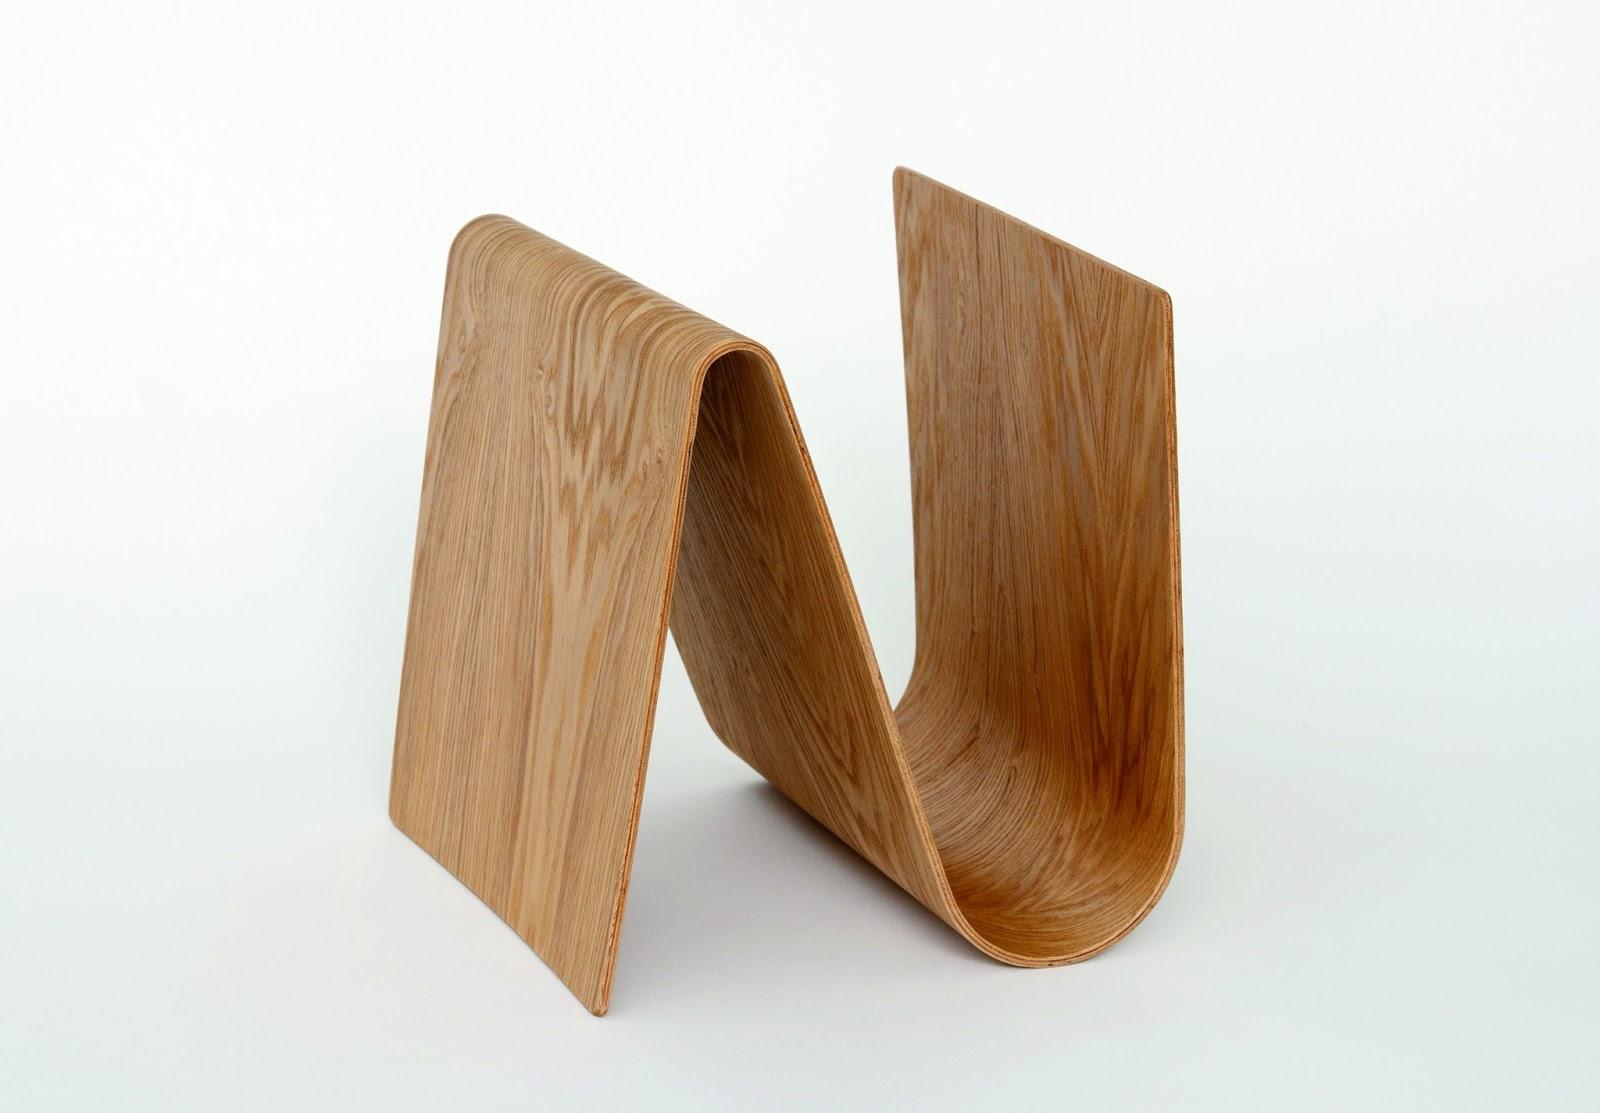 vert poussin monop 39. Black Bedroom Furniture Sets. Home Design Ideas